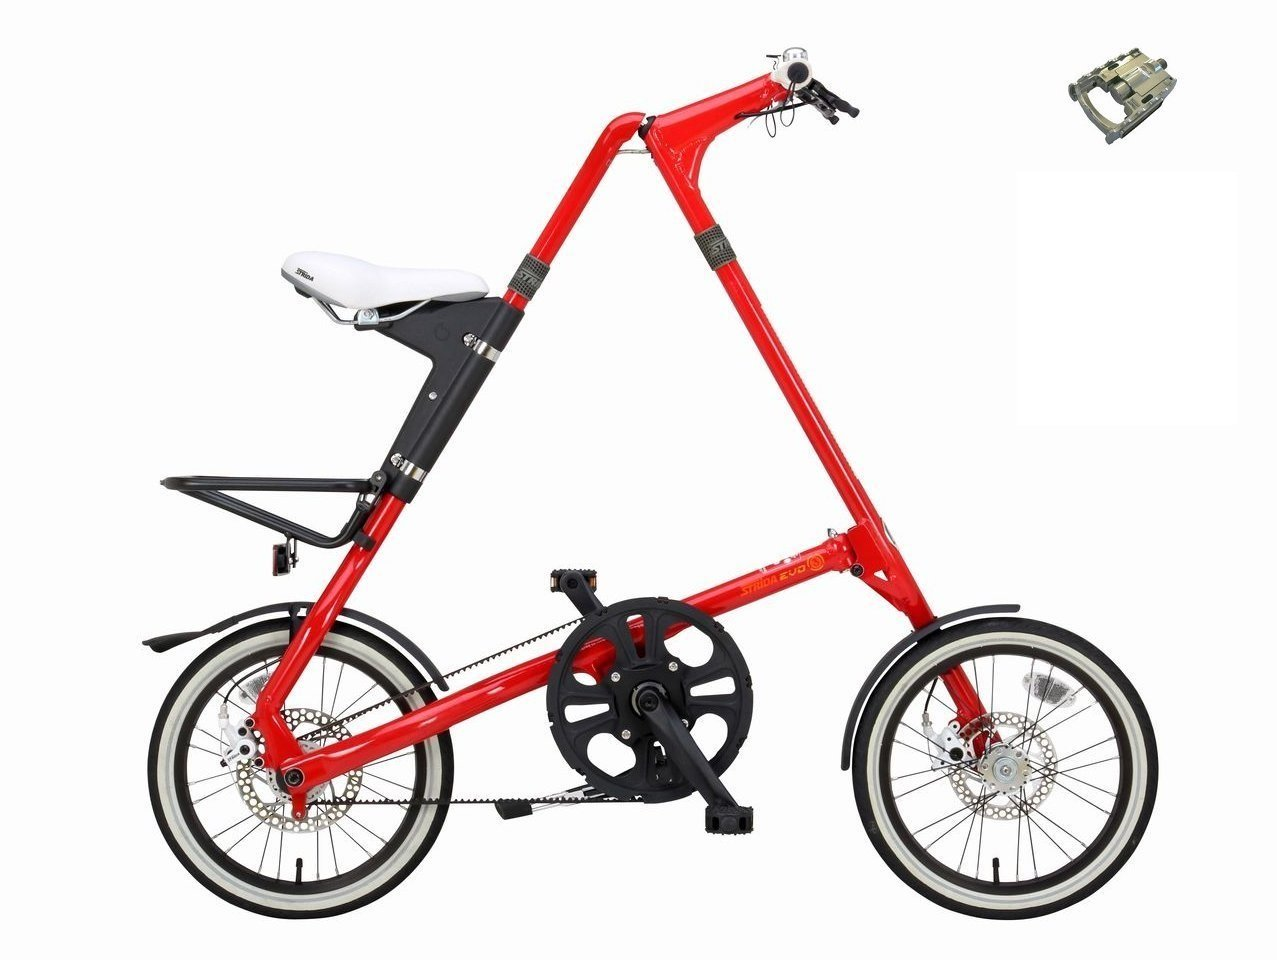 STRIDA EVO16(ストライダ エヴォ16) 折り畳み自転車 FD-7ペダル仕様 B07DJD41TJレッド